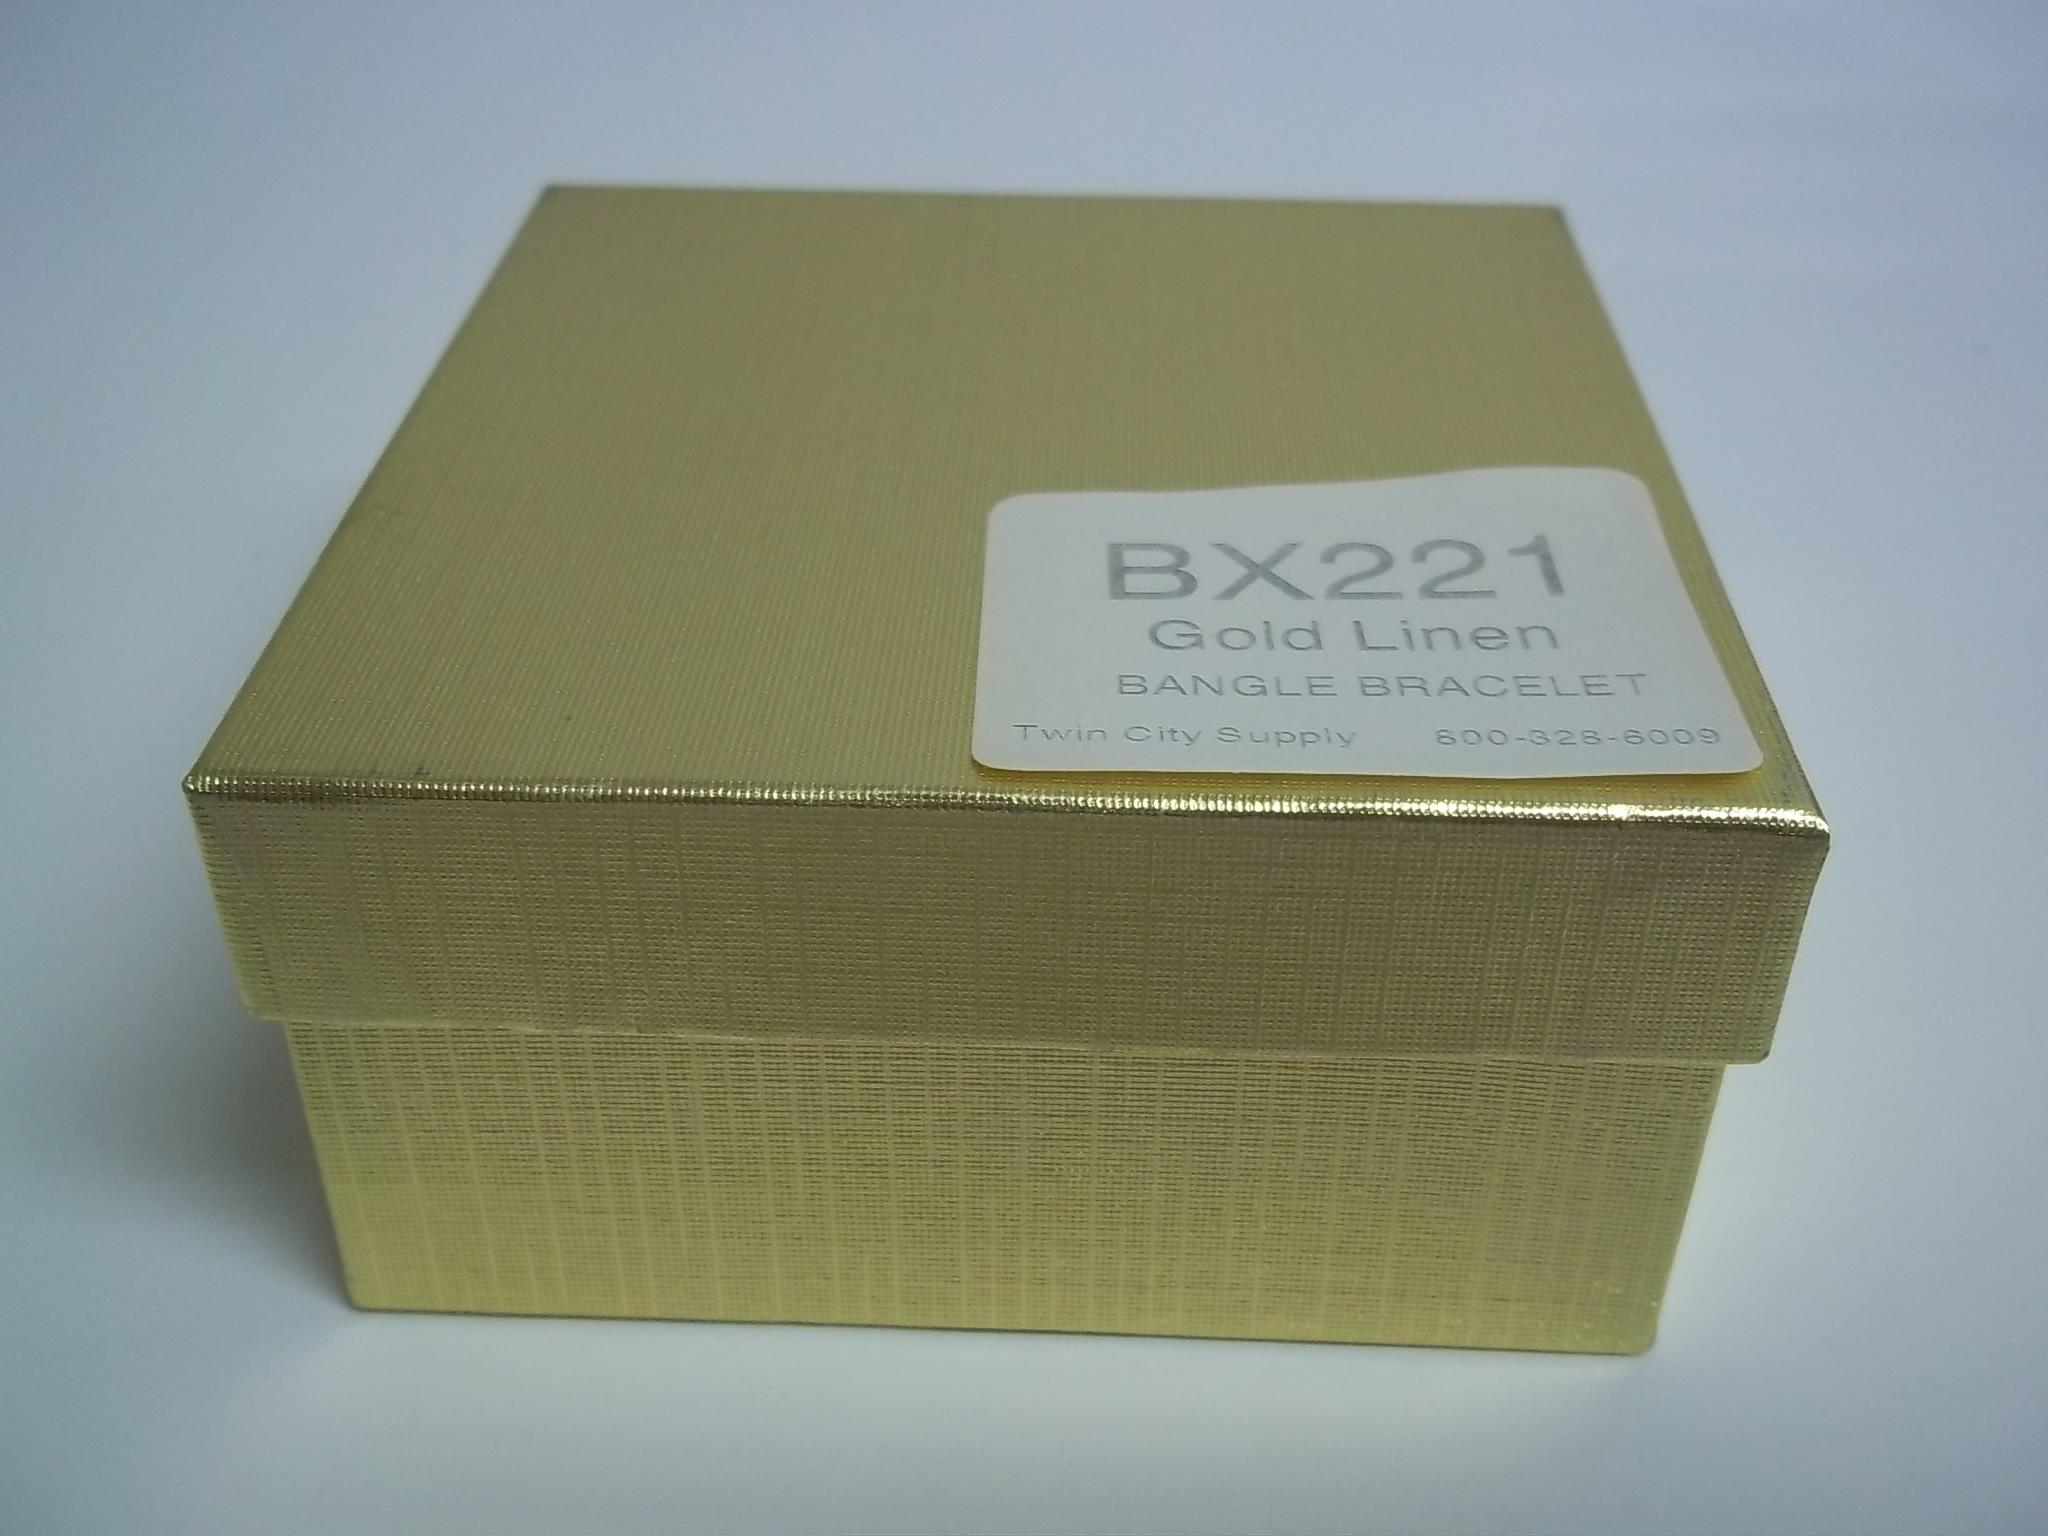 BX221 Cotton Filled Gold Linen Bangle Bracelet Nest Boxes